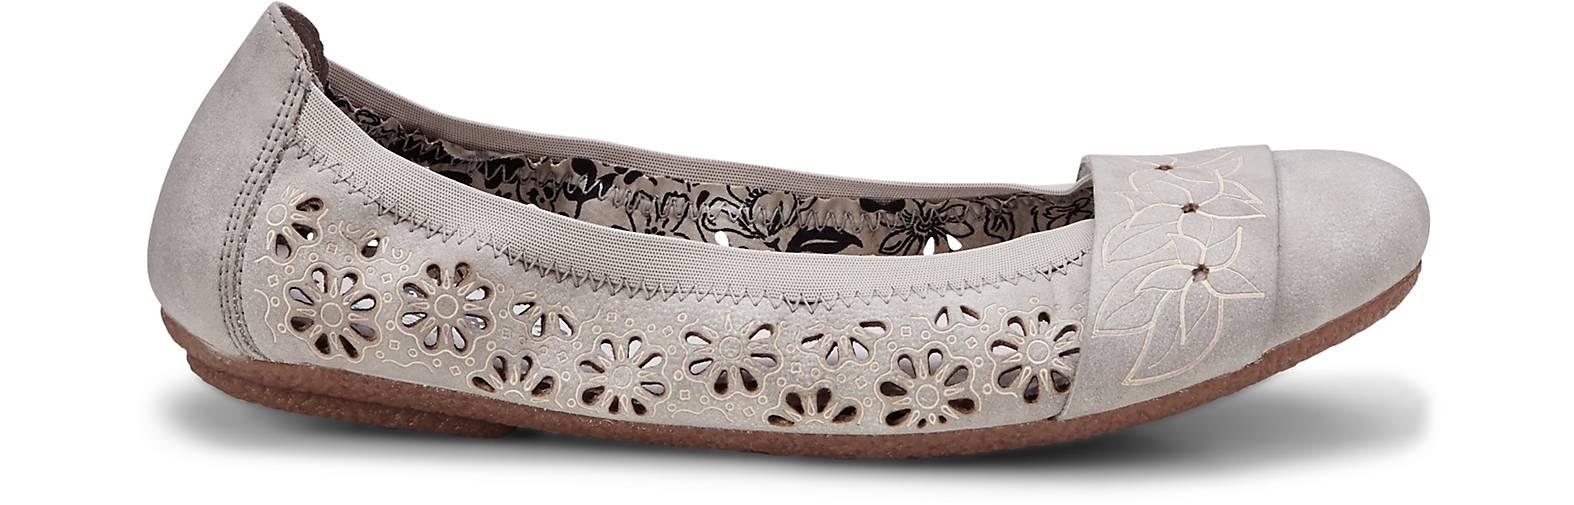 Rieker - Komfort-Ballerina in grau-hell kaufen - Rieker 45269801   GÖRTZ Gute Qualität beliebte Schuhe dcdd04